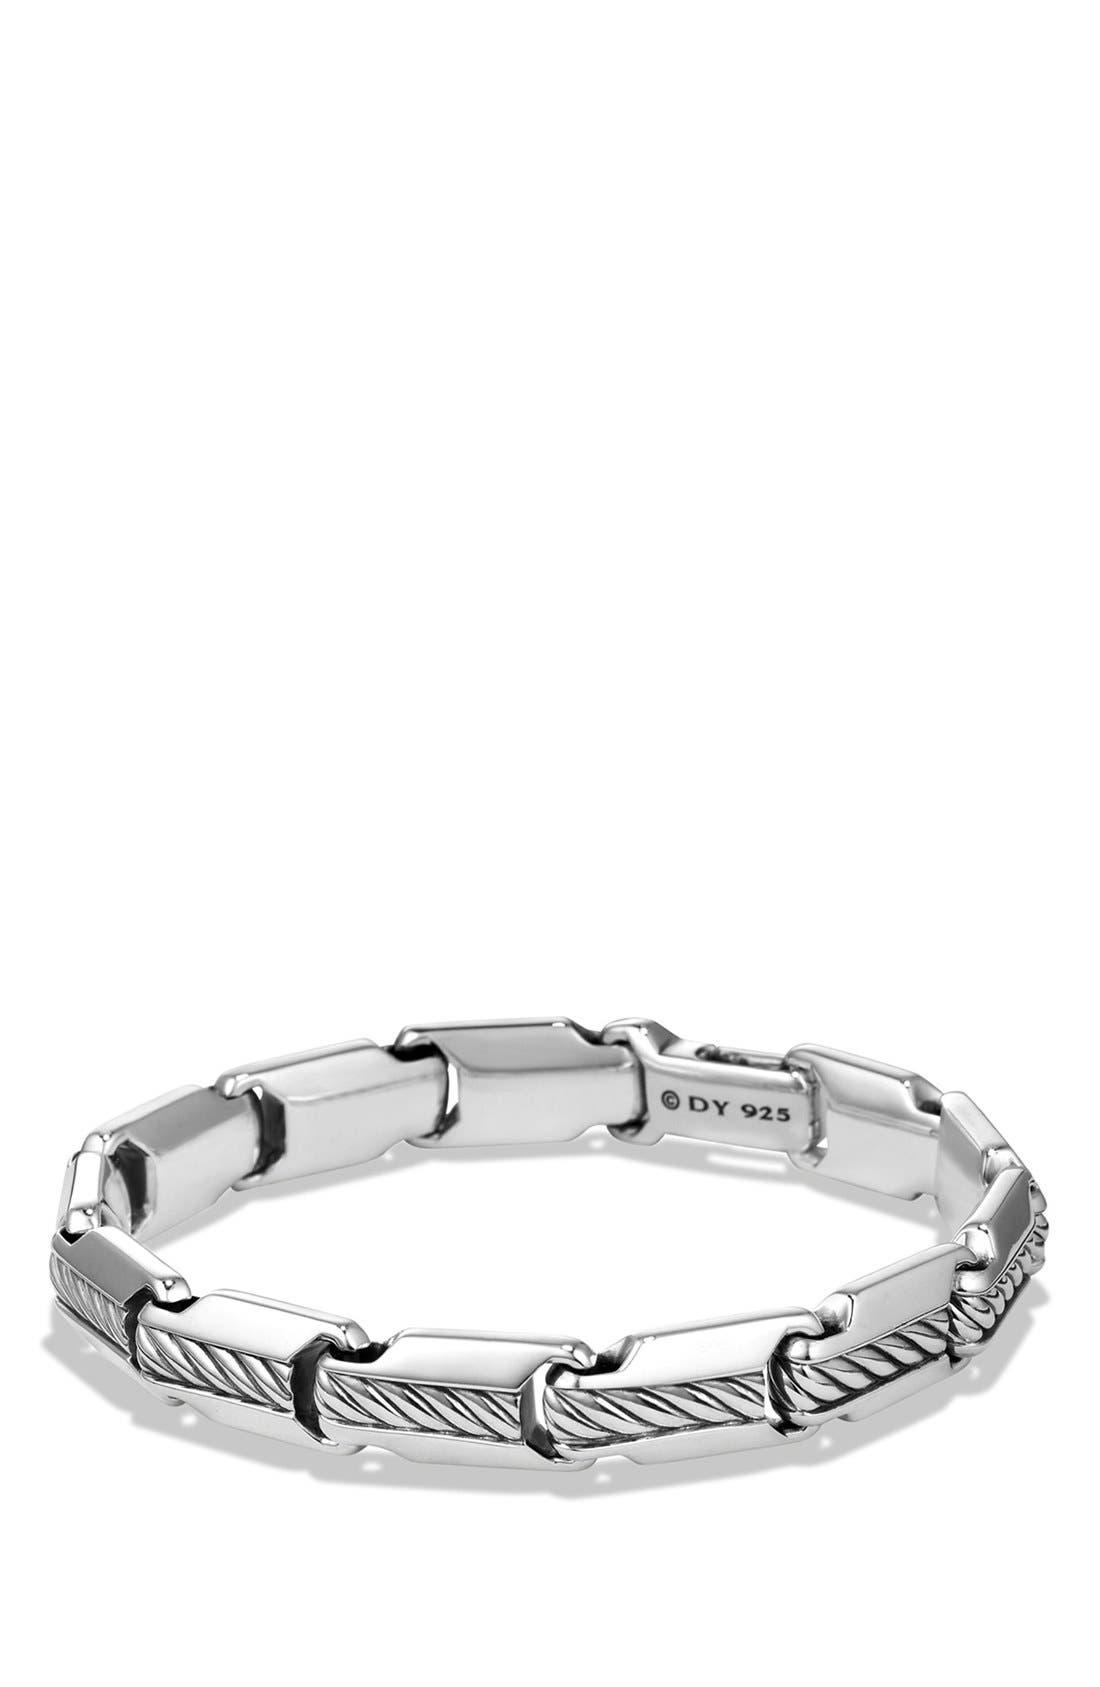 David Yurman'Cable Classics' Beveled Edge Chain Bracelet